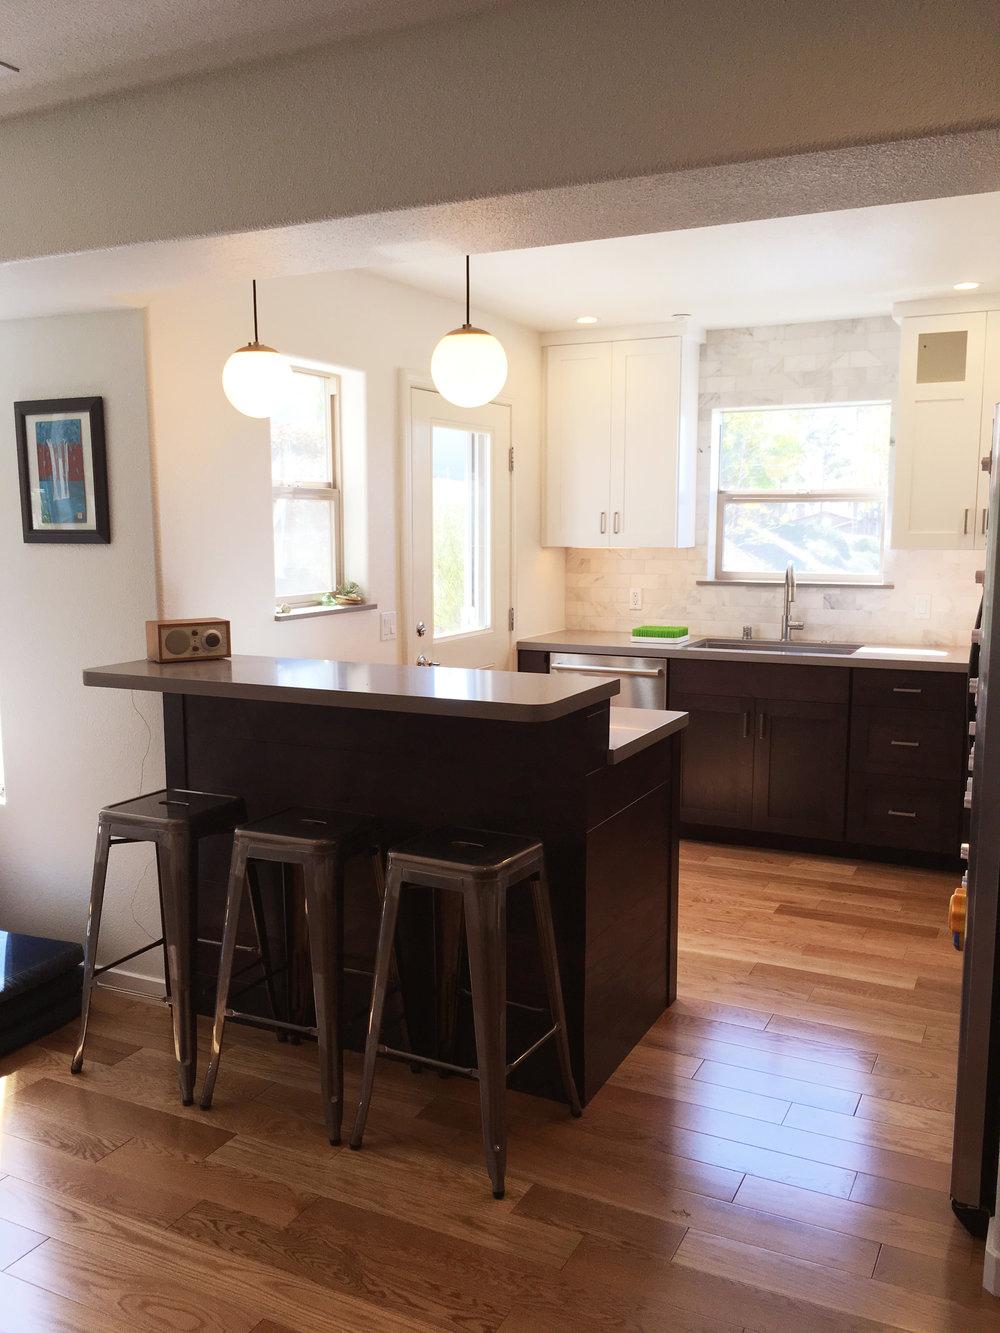 Morro Bay Kitchen Renovation: After